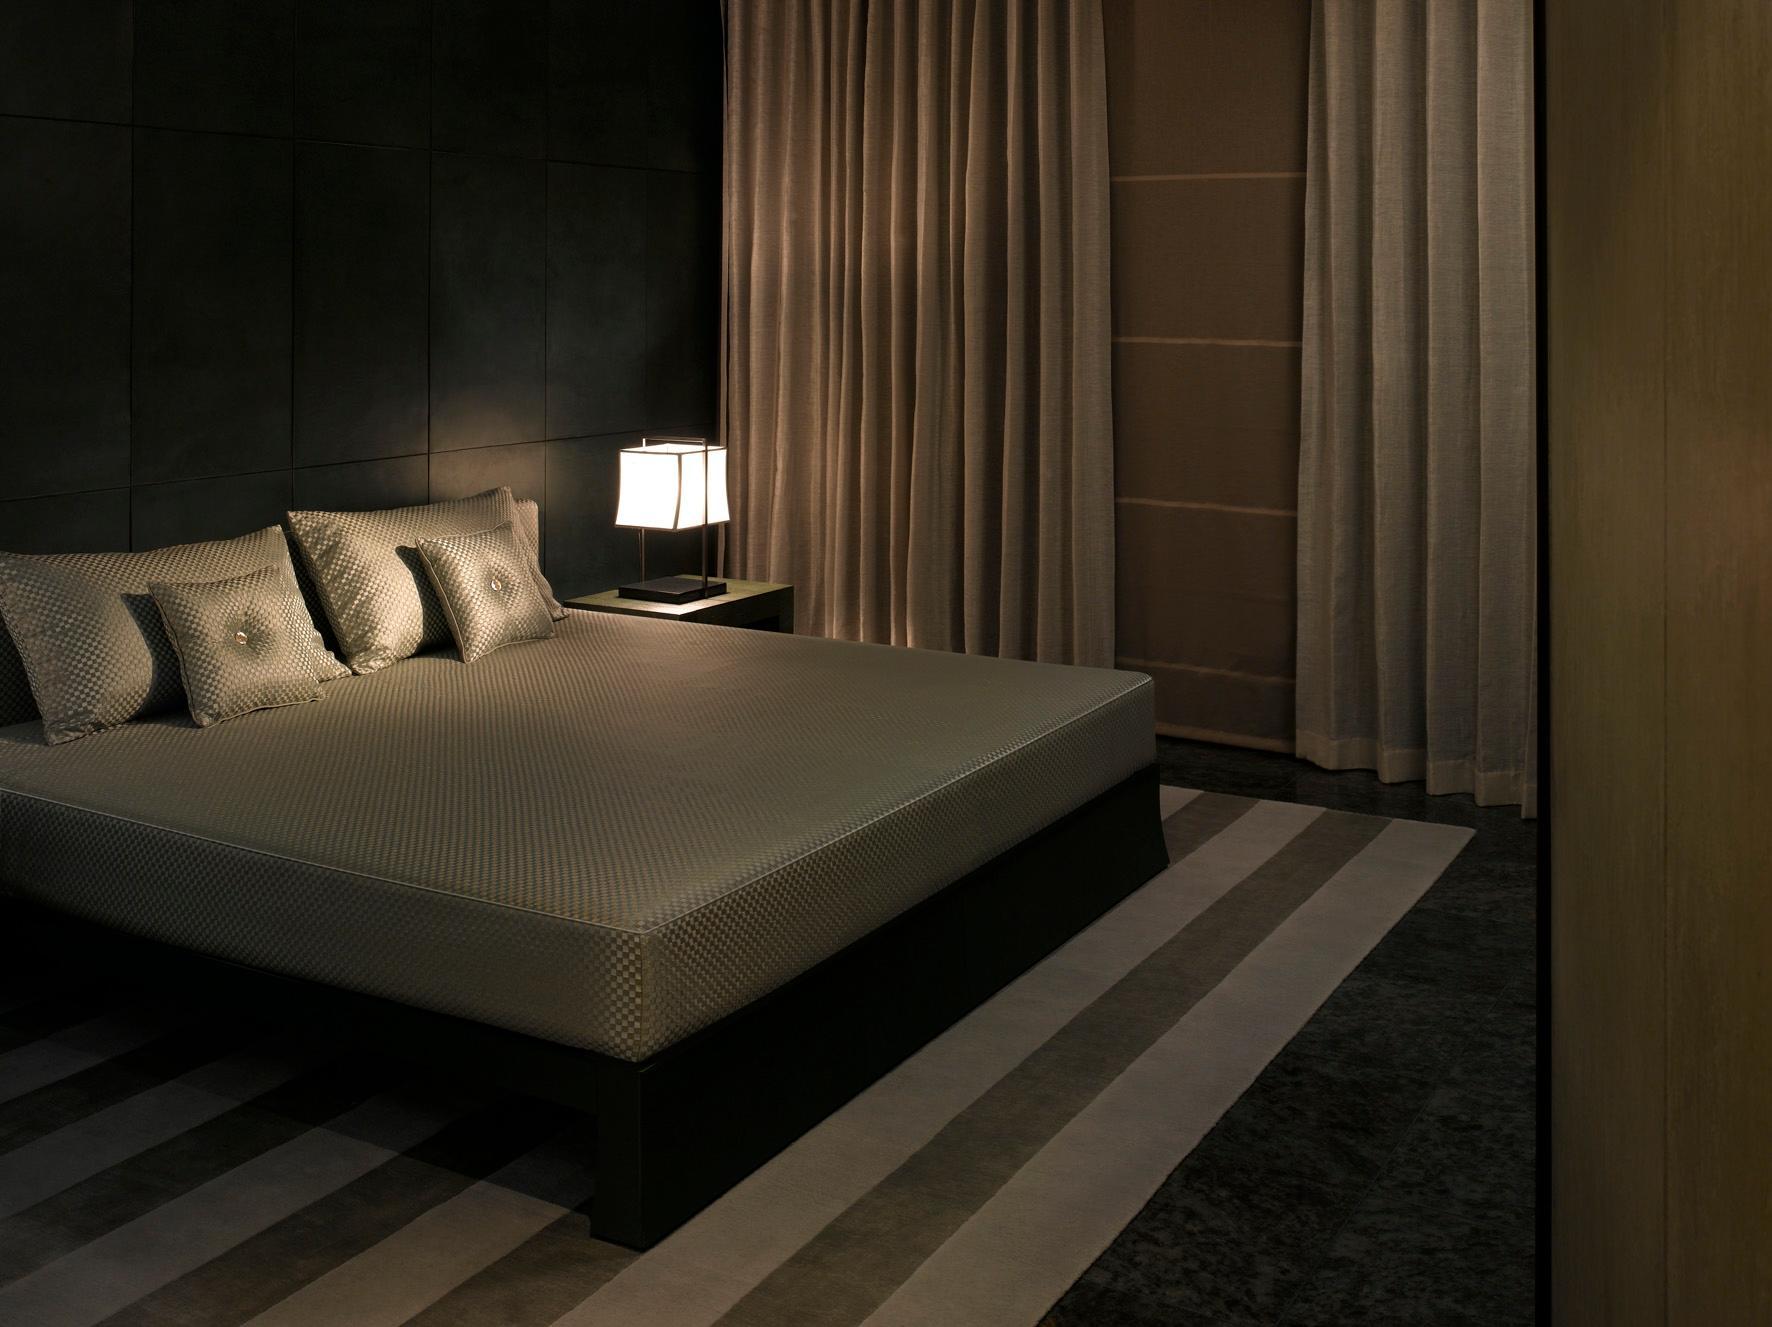 Armani hotel dubai dubai - Dormitorios arabes ...